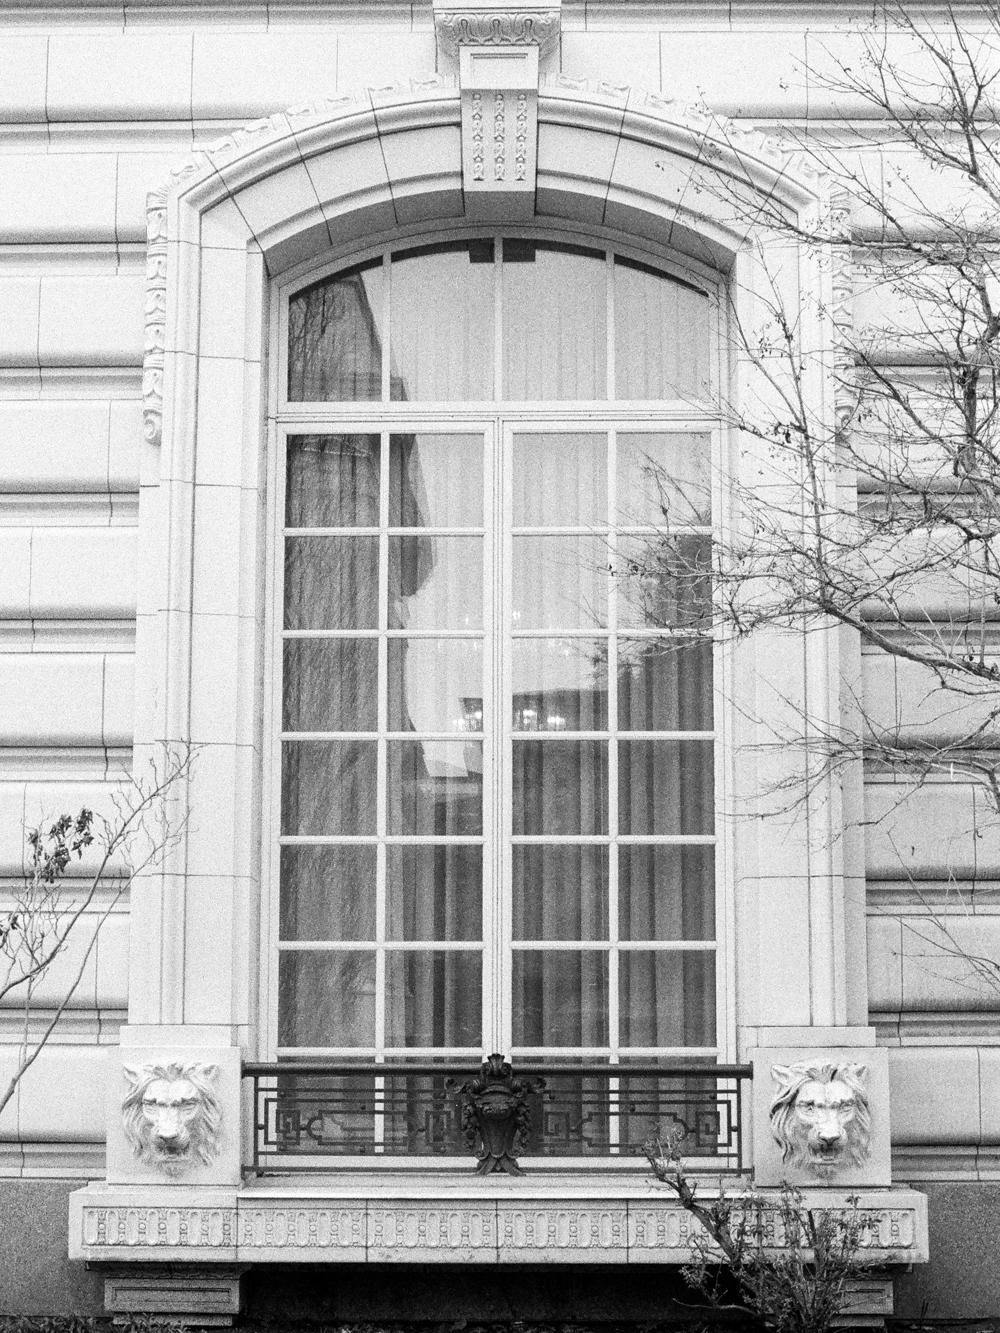 Christine-gosch-utah-film-photographer-destination-photographer-delta-3200-black-and-white-8.jpg